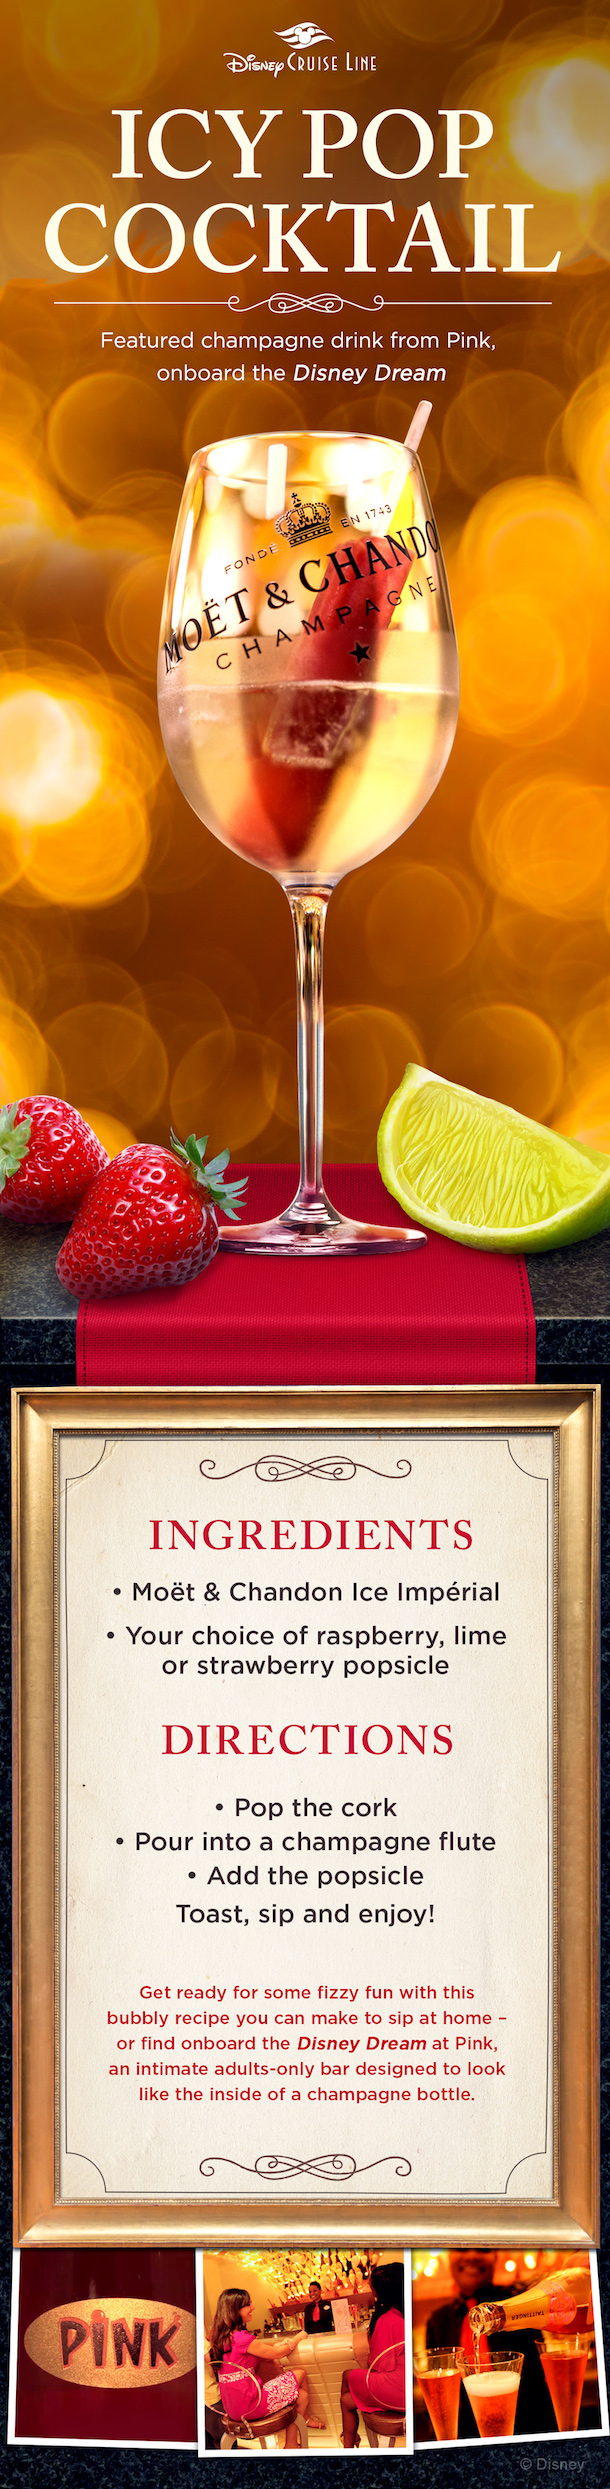 Disney Recipes: Icy Pop Cocktail - Disney Dream